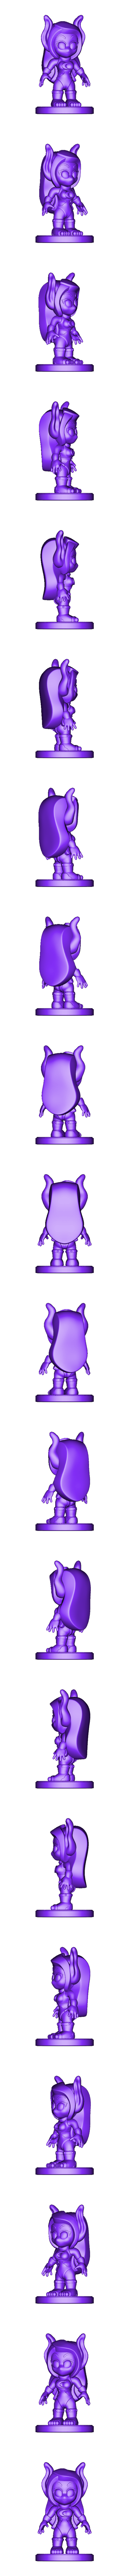 Miroku chibi3.stl Descargar archivo STL Rumi Usagiyama ( Mirko ) chibi • Modelo para la impresión en 3D, MatteoMoscatelli